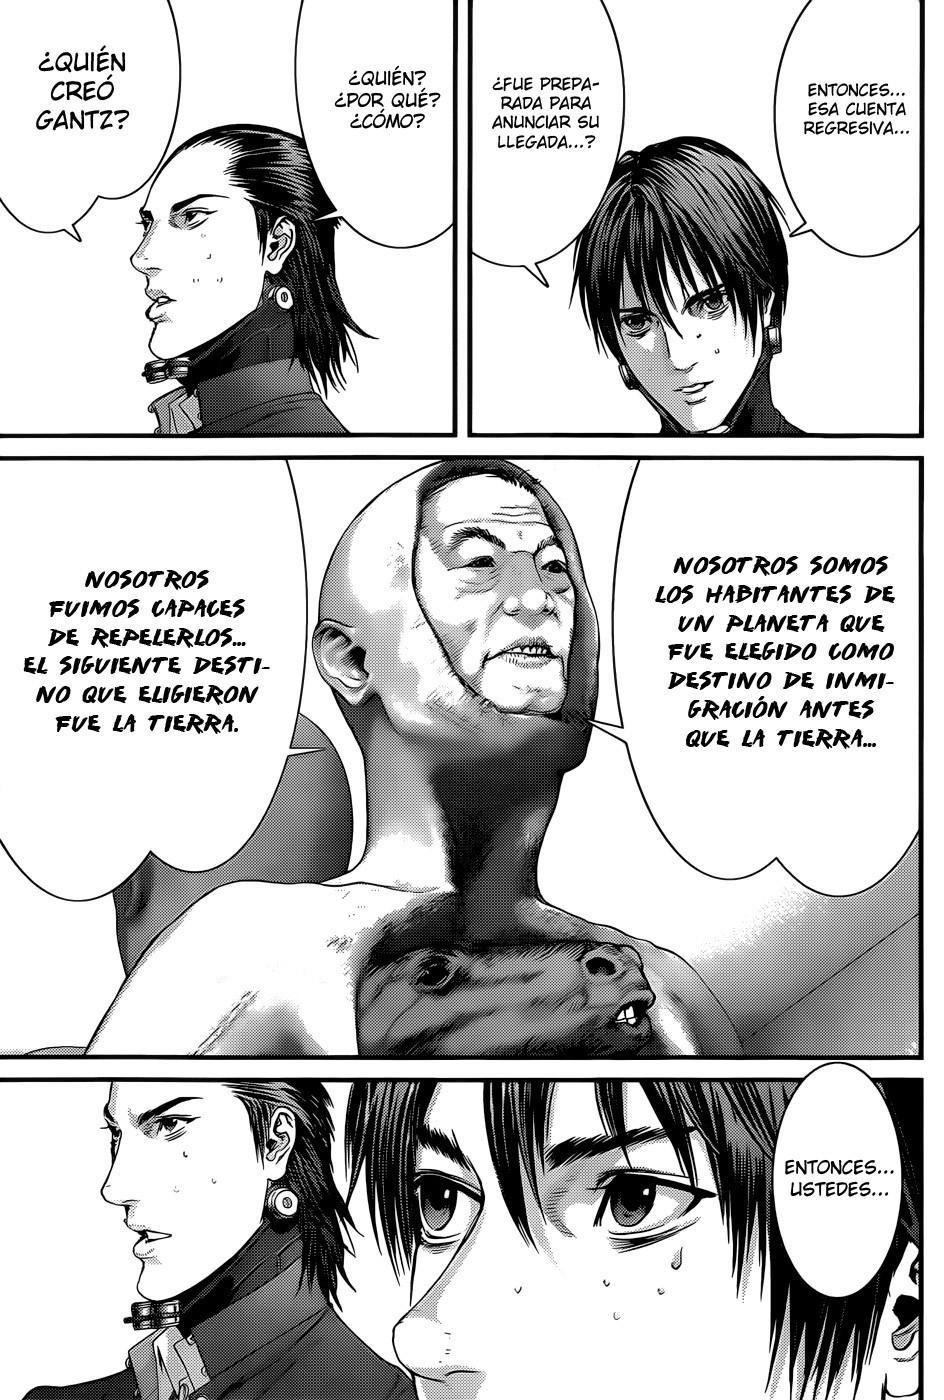 Manga Gantz capitulo 369 16